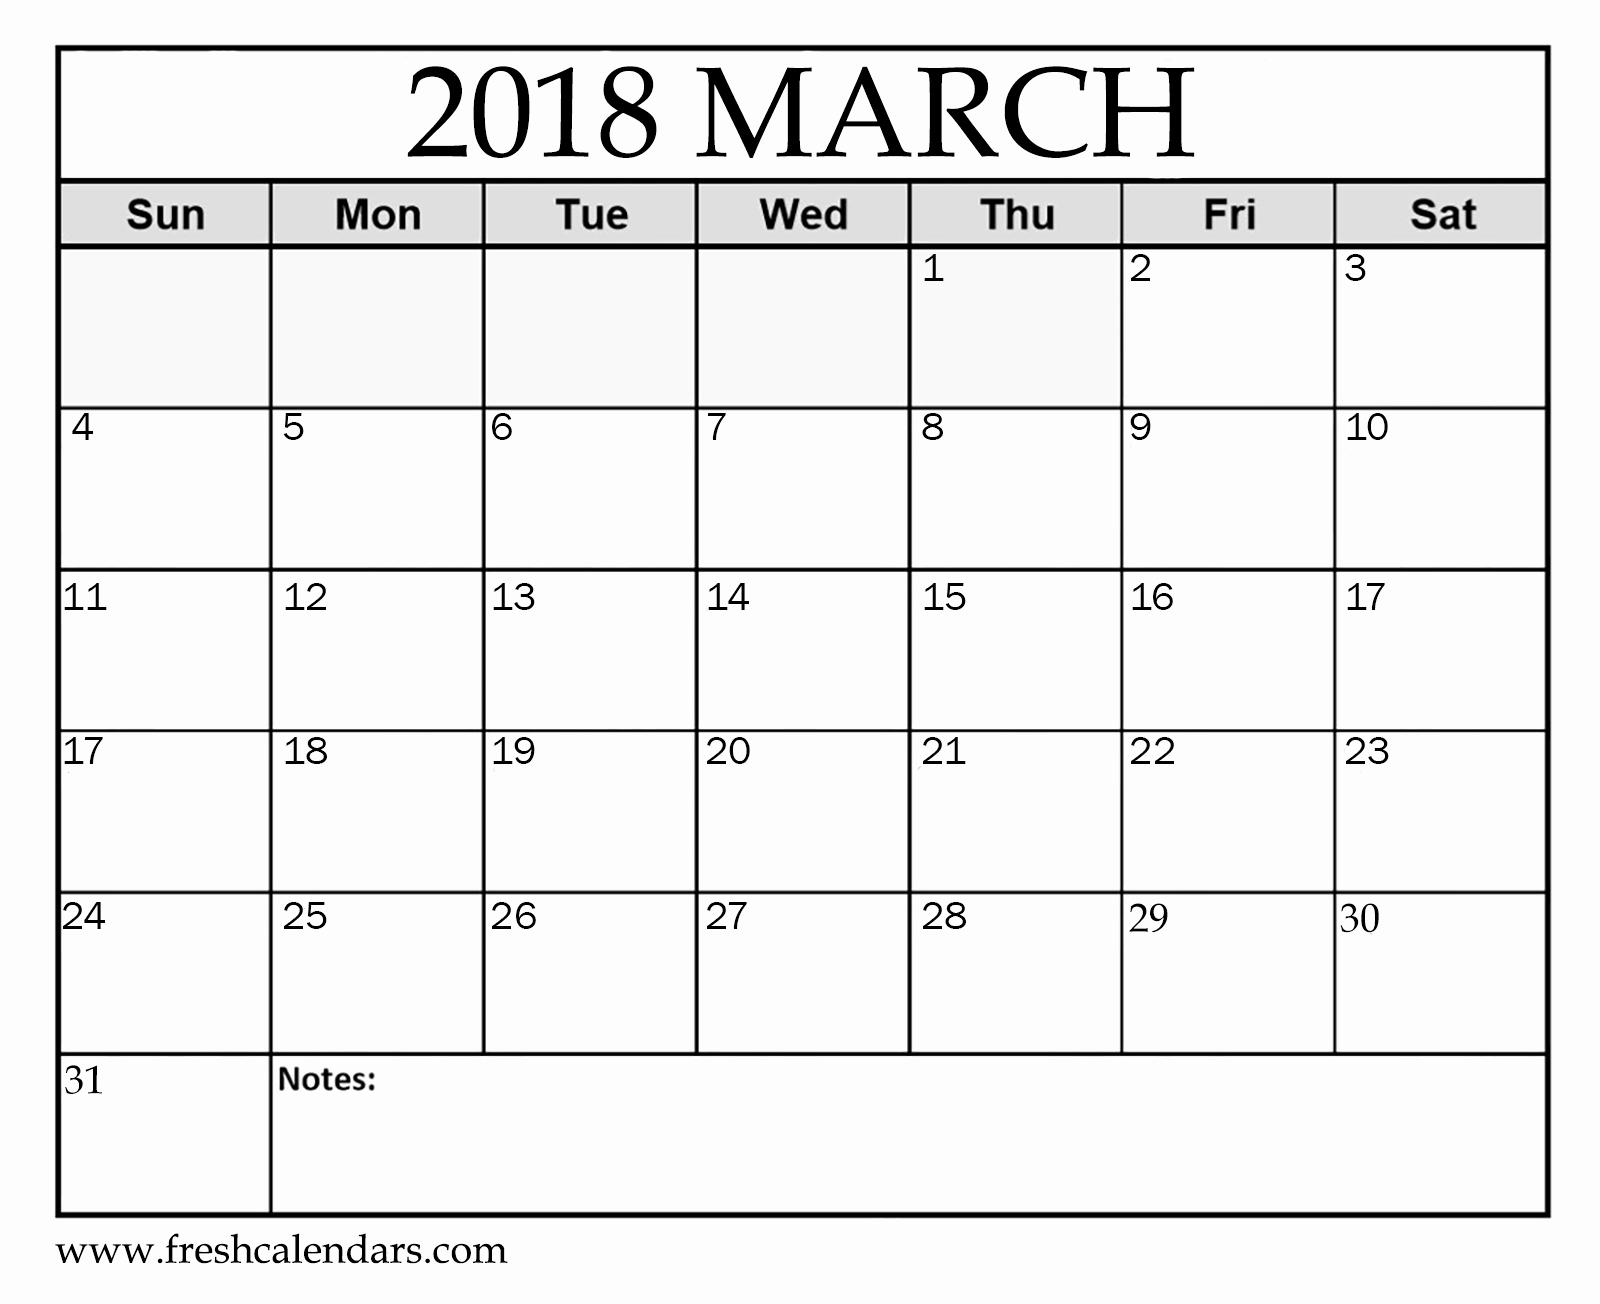 Blank Monthly Calendar Pdf Lovely Printable March 2018 Calendar Fresh Calendars